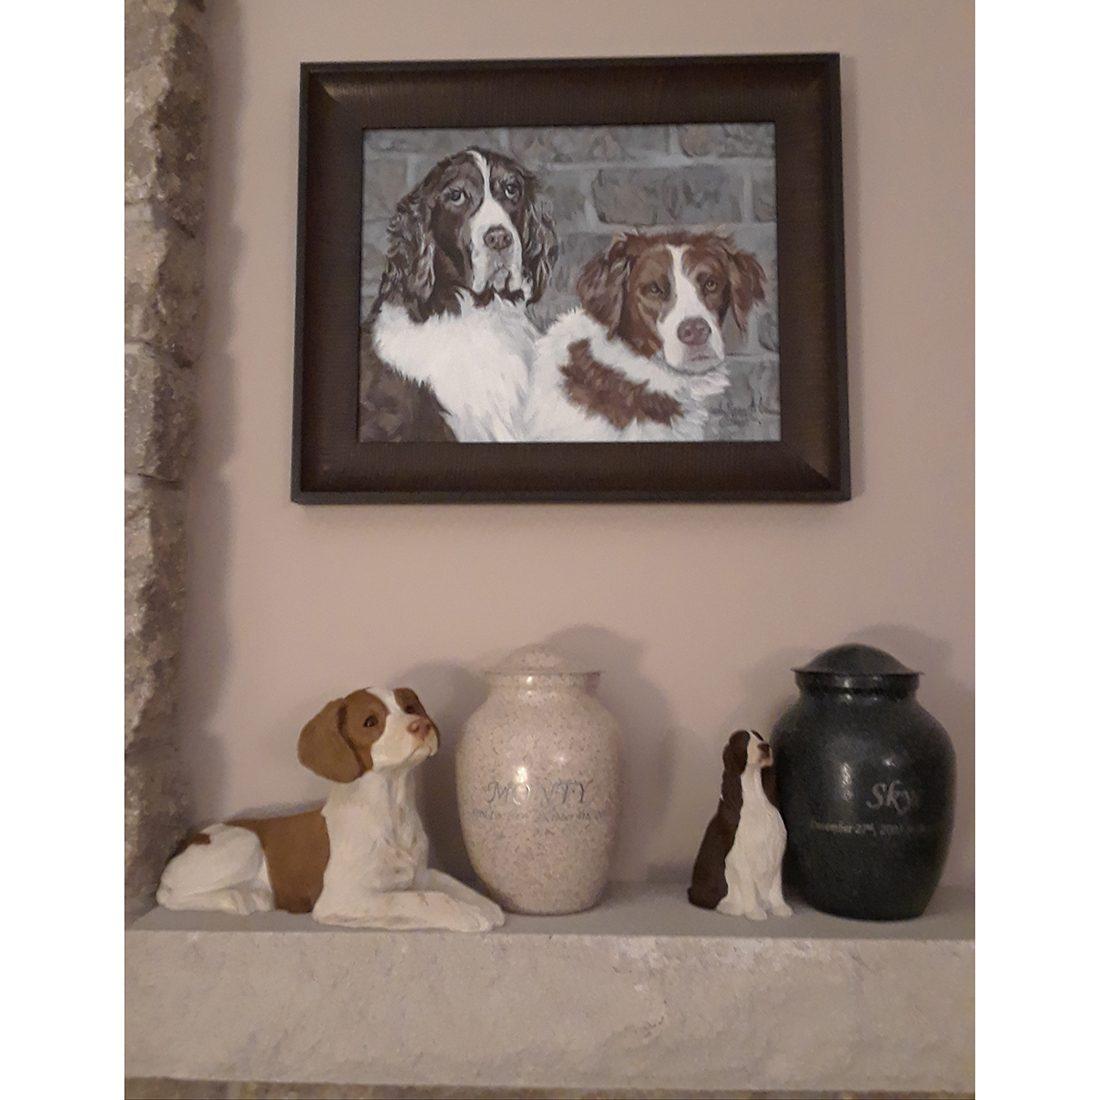 Dog shelfie